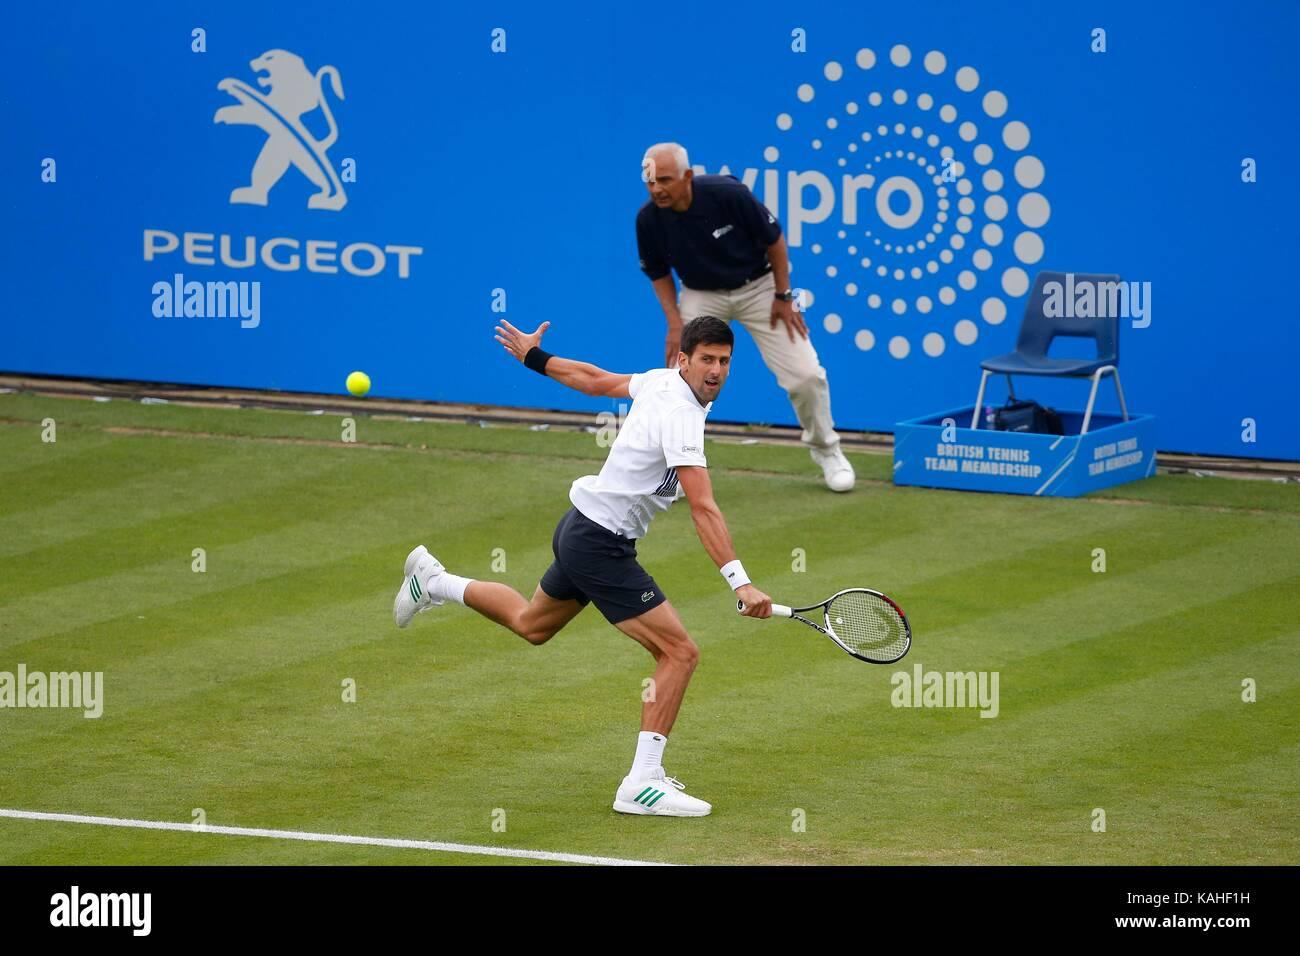 Serbian Novak Djokovic in action against Canadian Vasek Pospisil on day five of the Aegon International at Devonshire - Stock Image